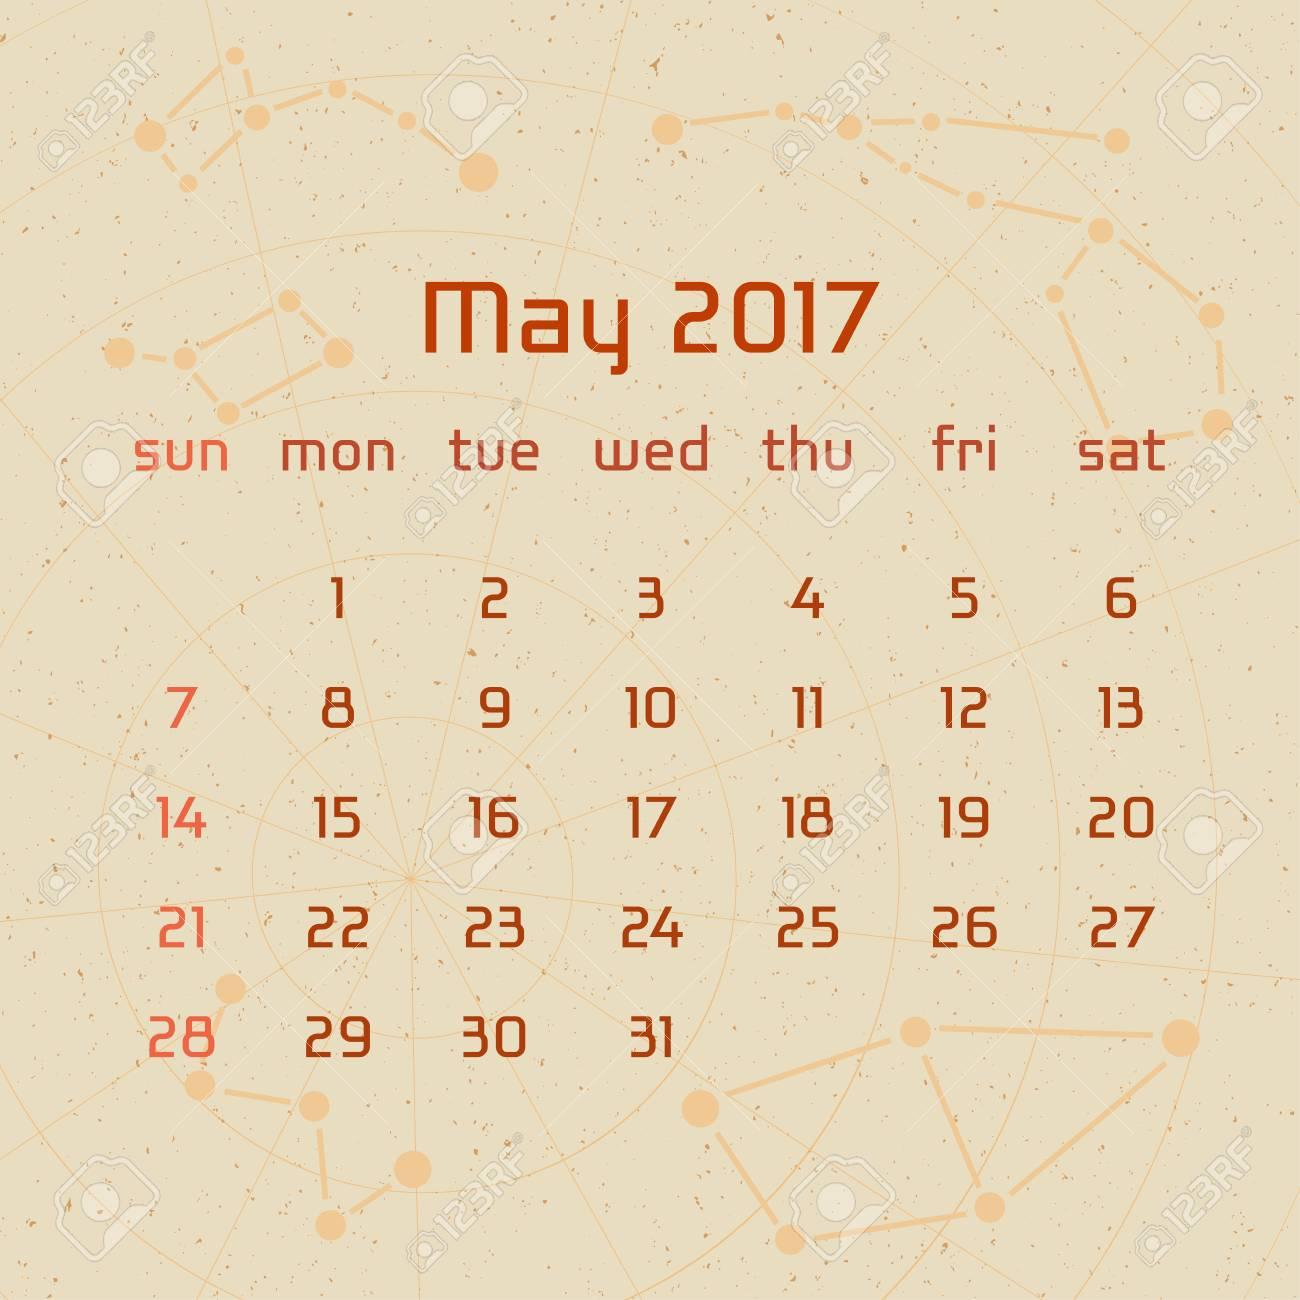 Calendar Ideas For May : Vector calendar for in the retro style calendar for the